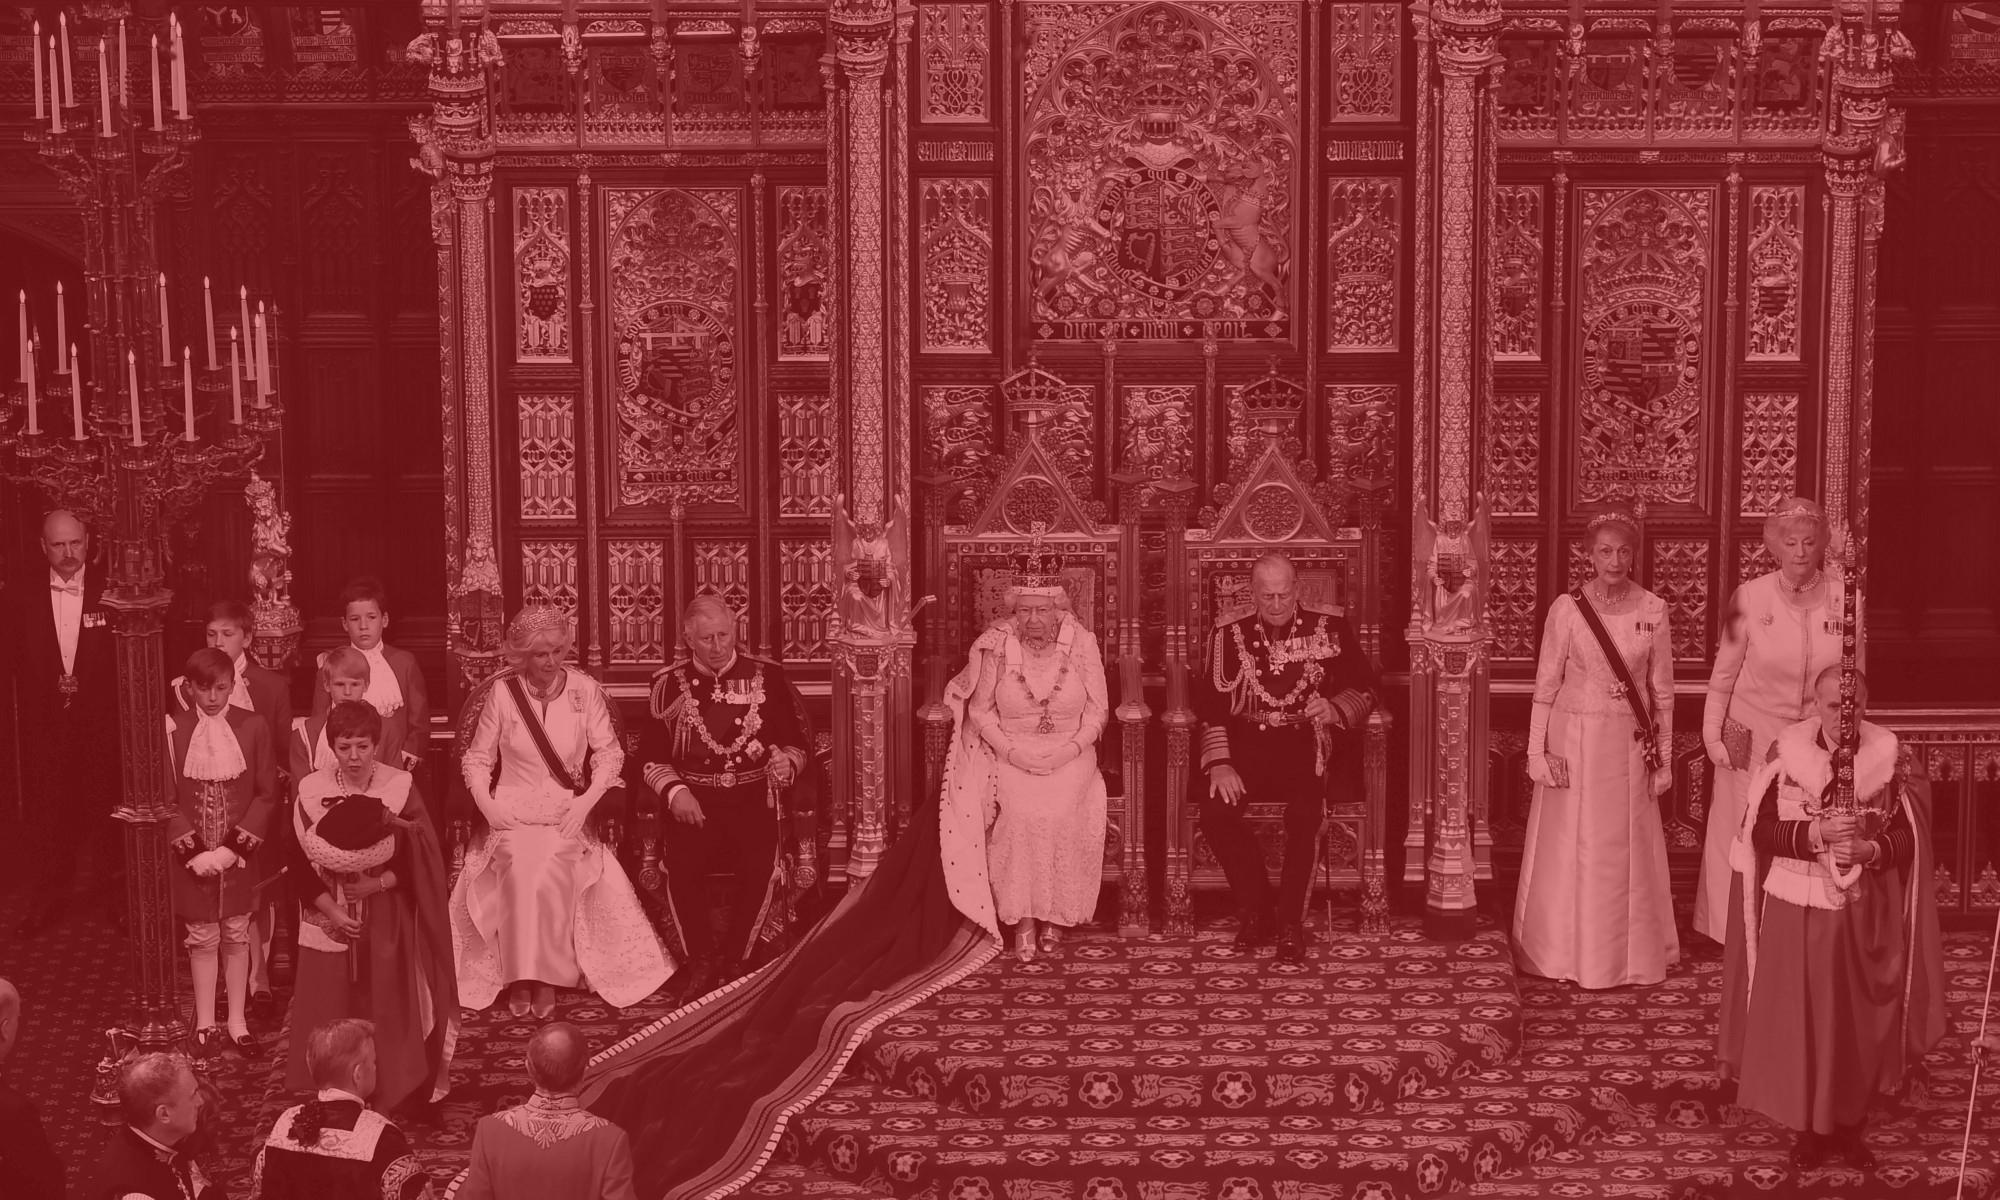 3. Rip up the Royal Prerogative